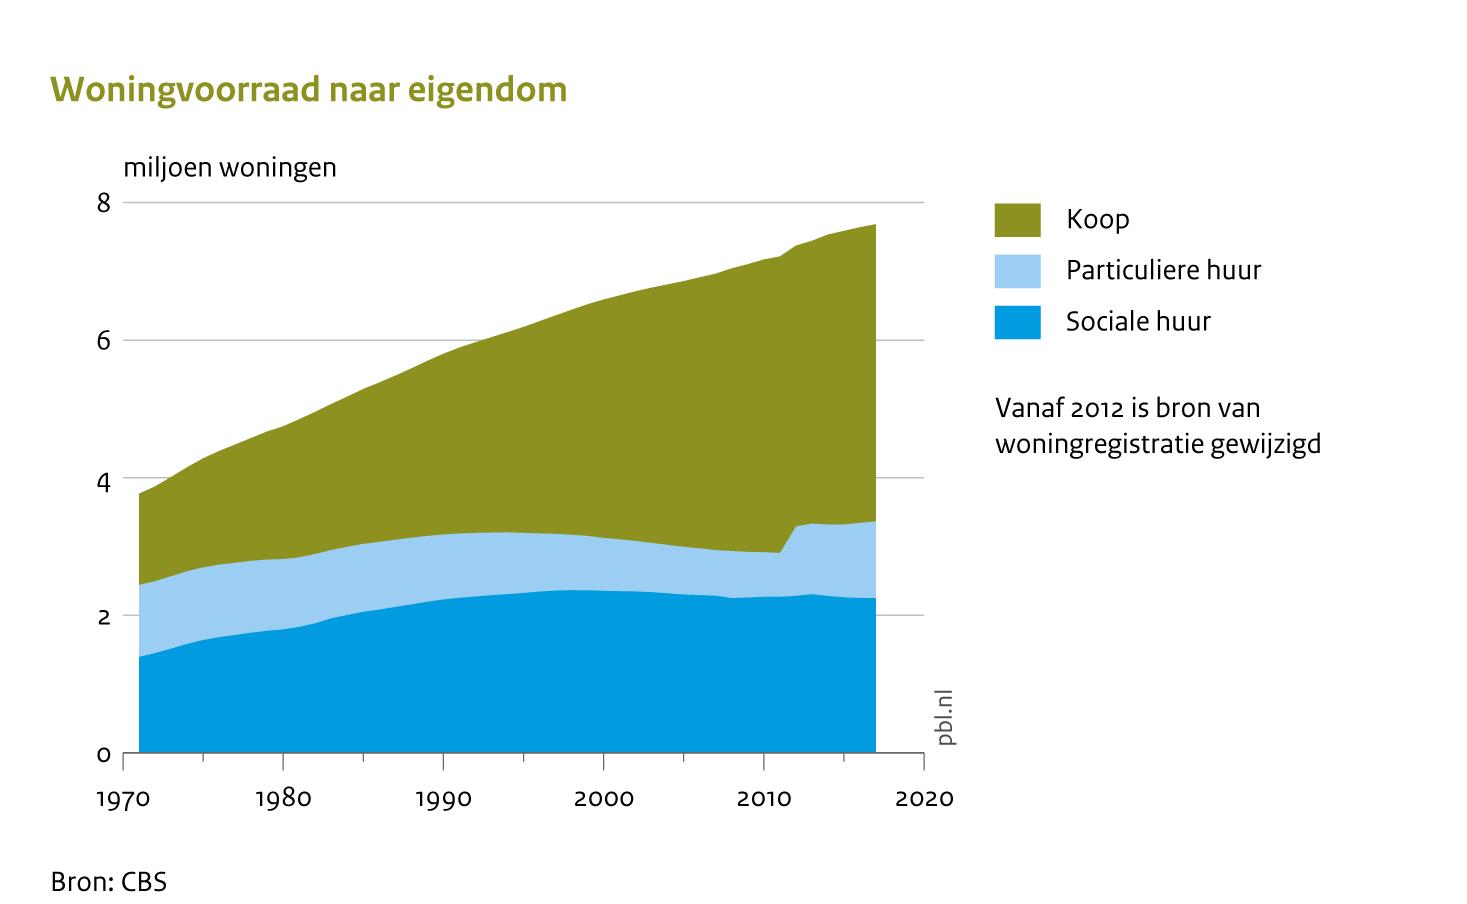 https://data.pbl.nl/api/embed/infographic/data/nl/blo/2215_001g/03/2215_001g_blo_03_nl.png